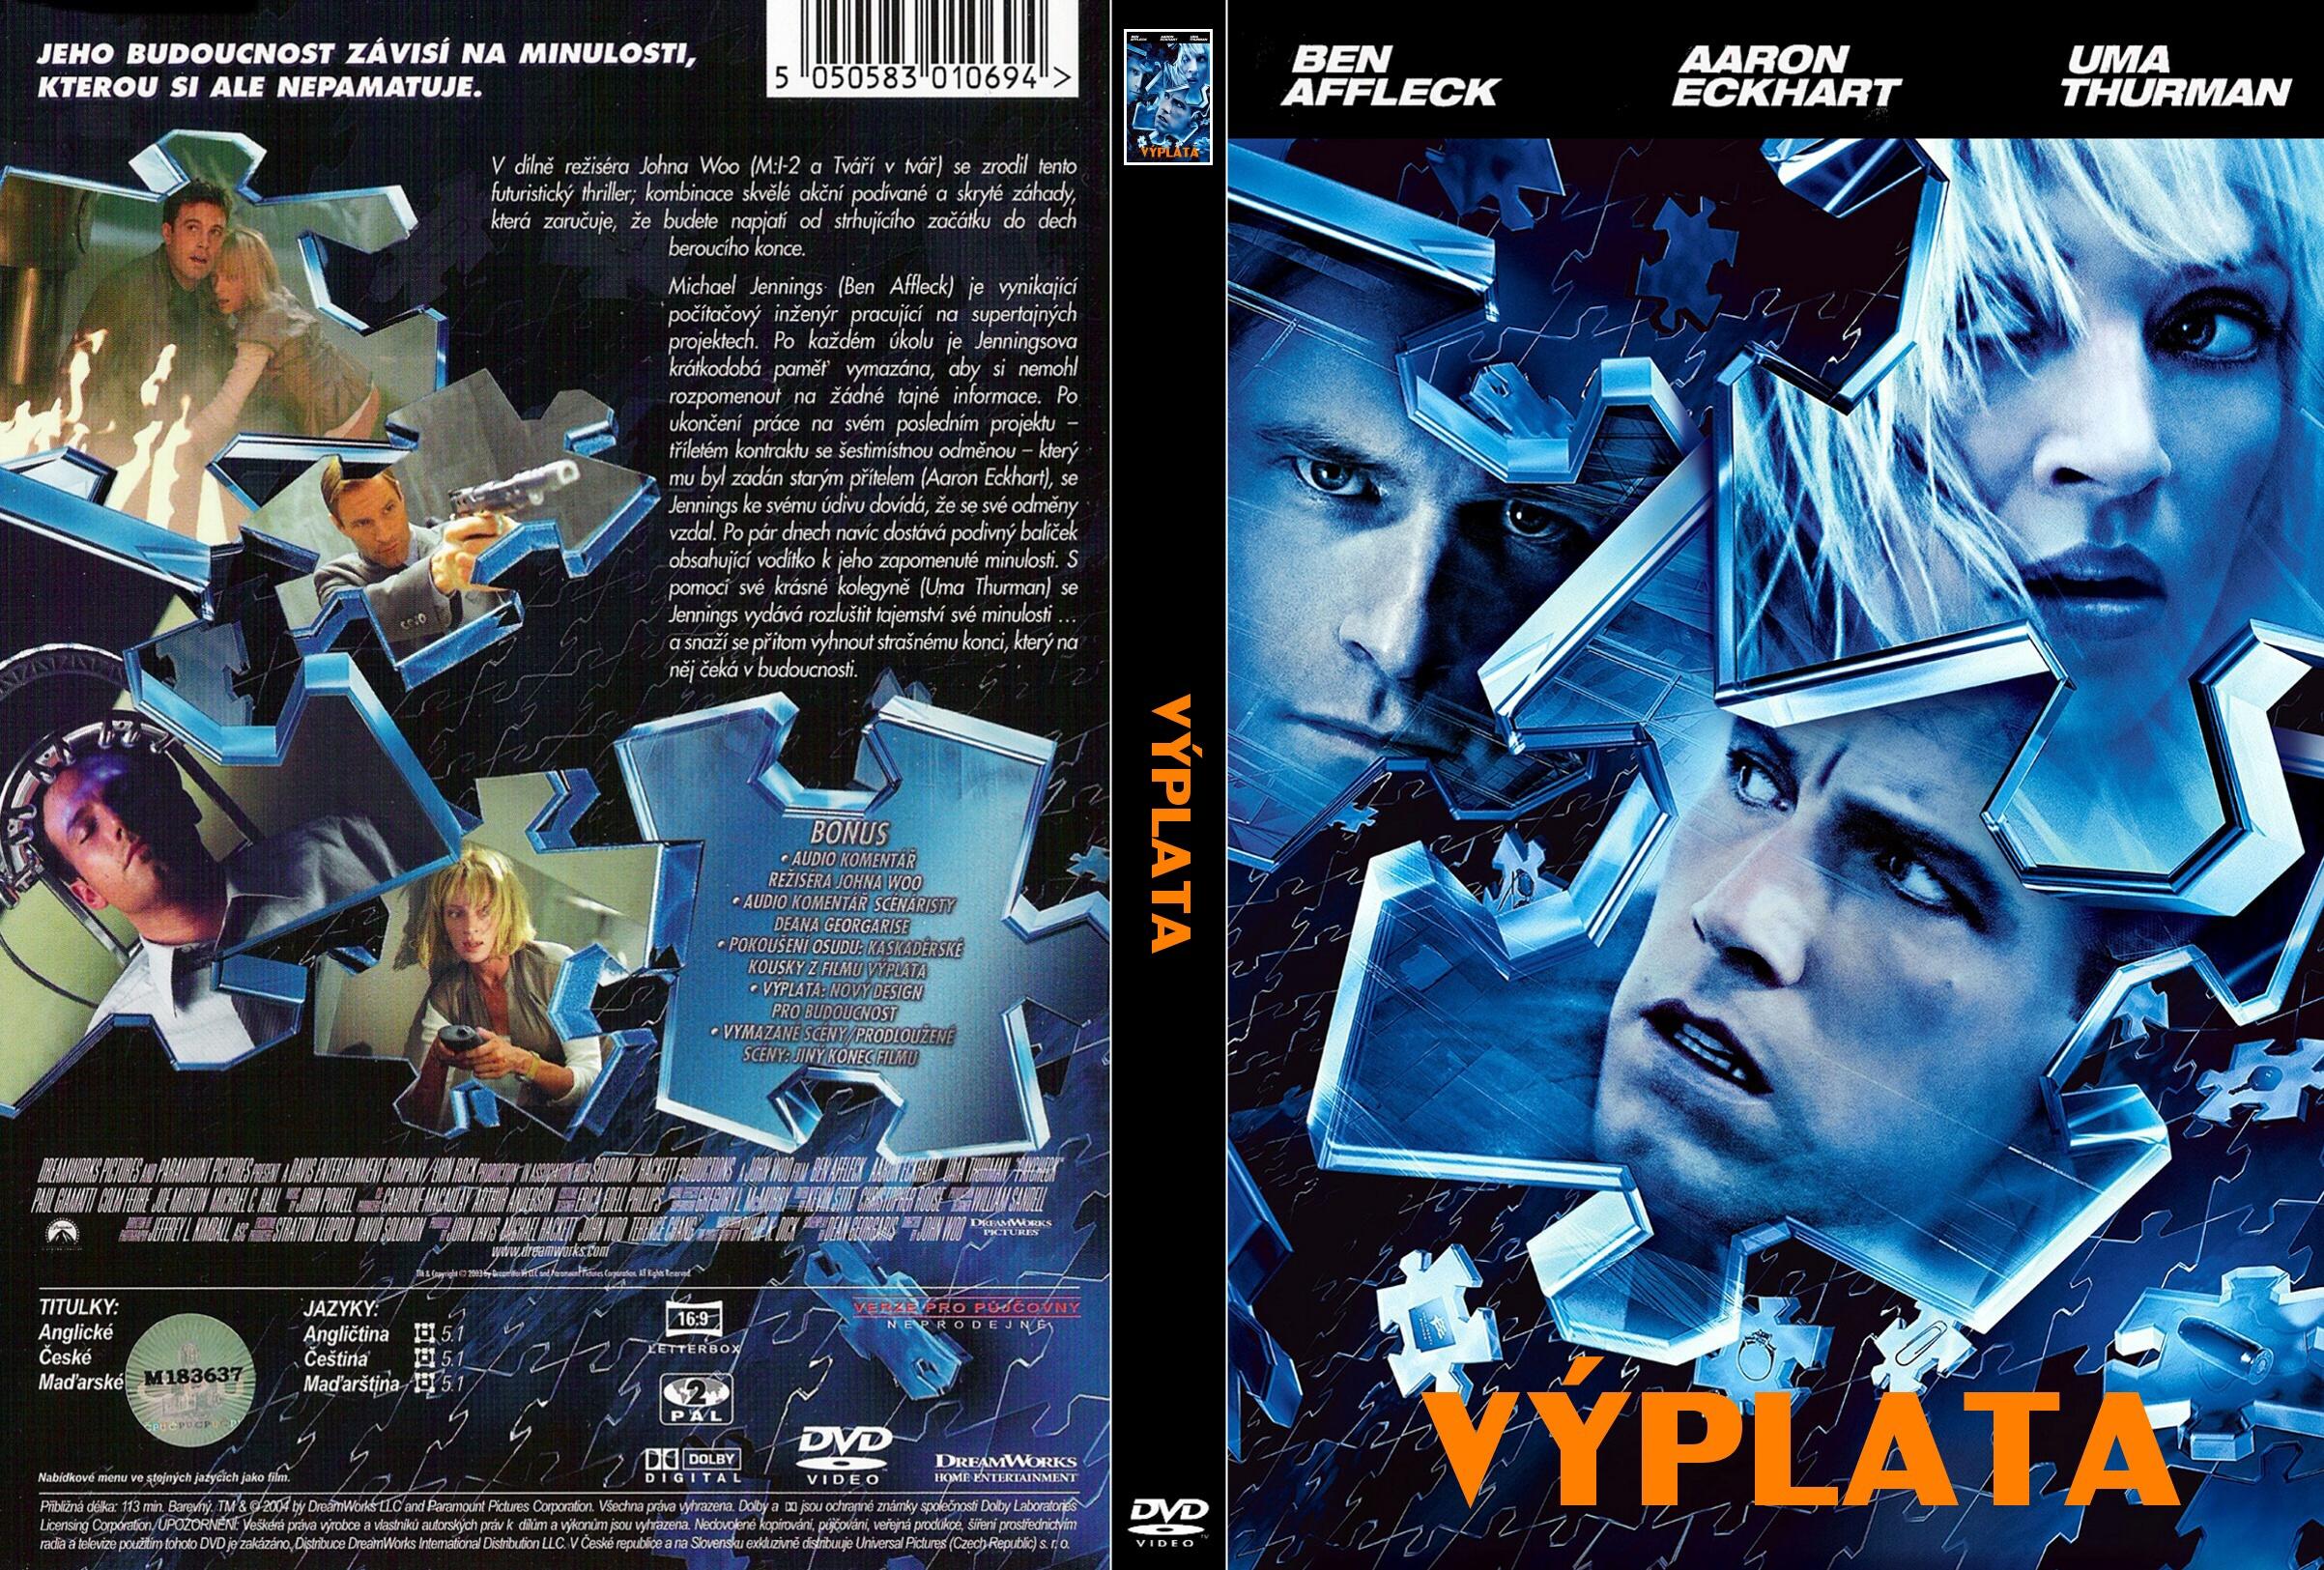 COVERS BOX SK ::: Paycheck (2003) - high quality DVD